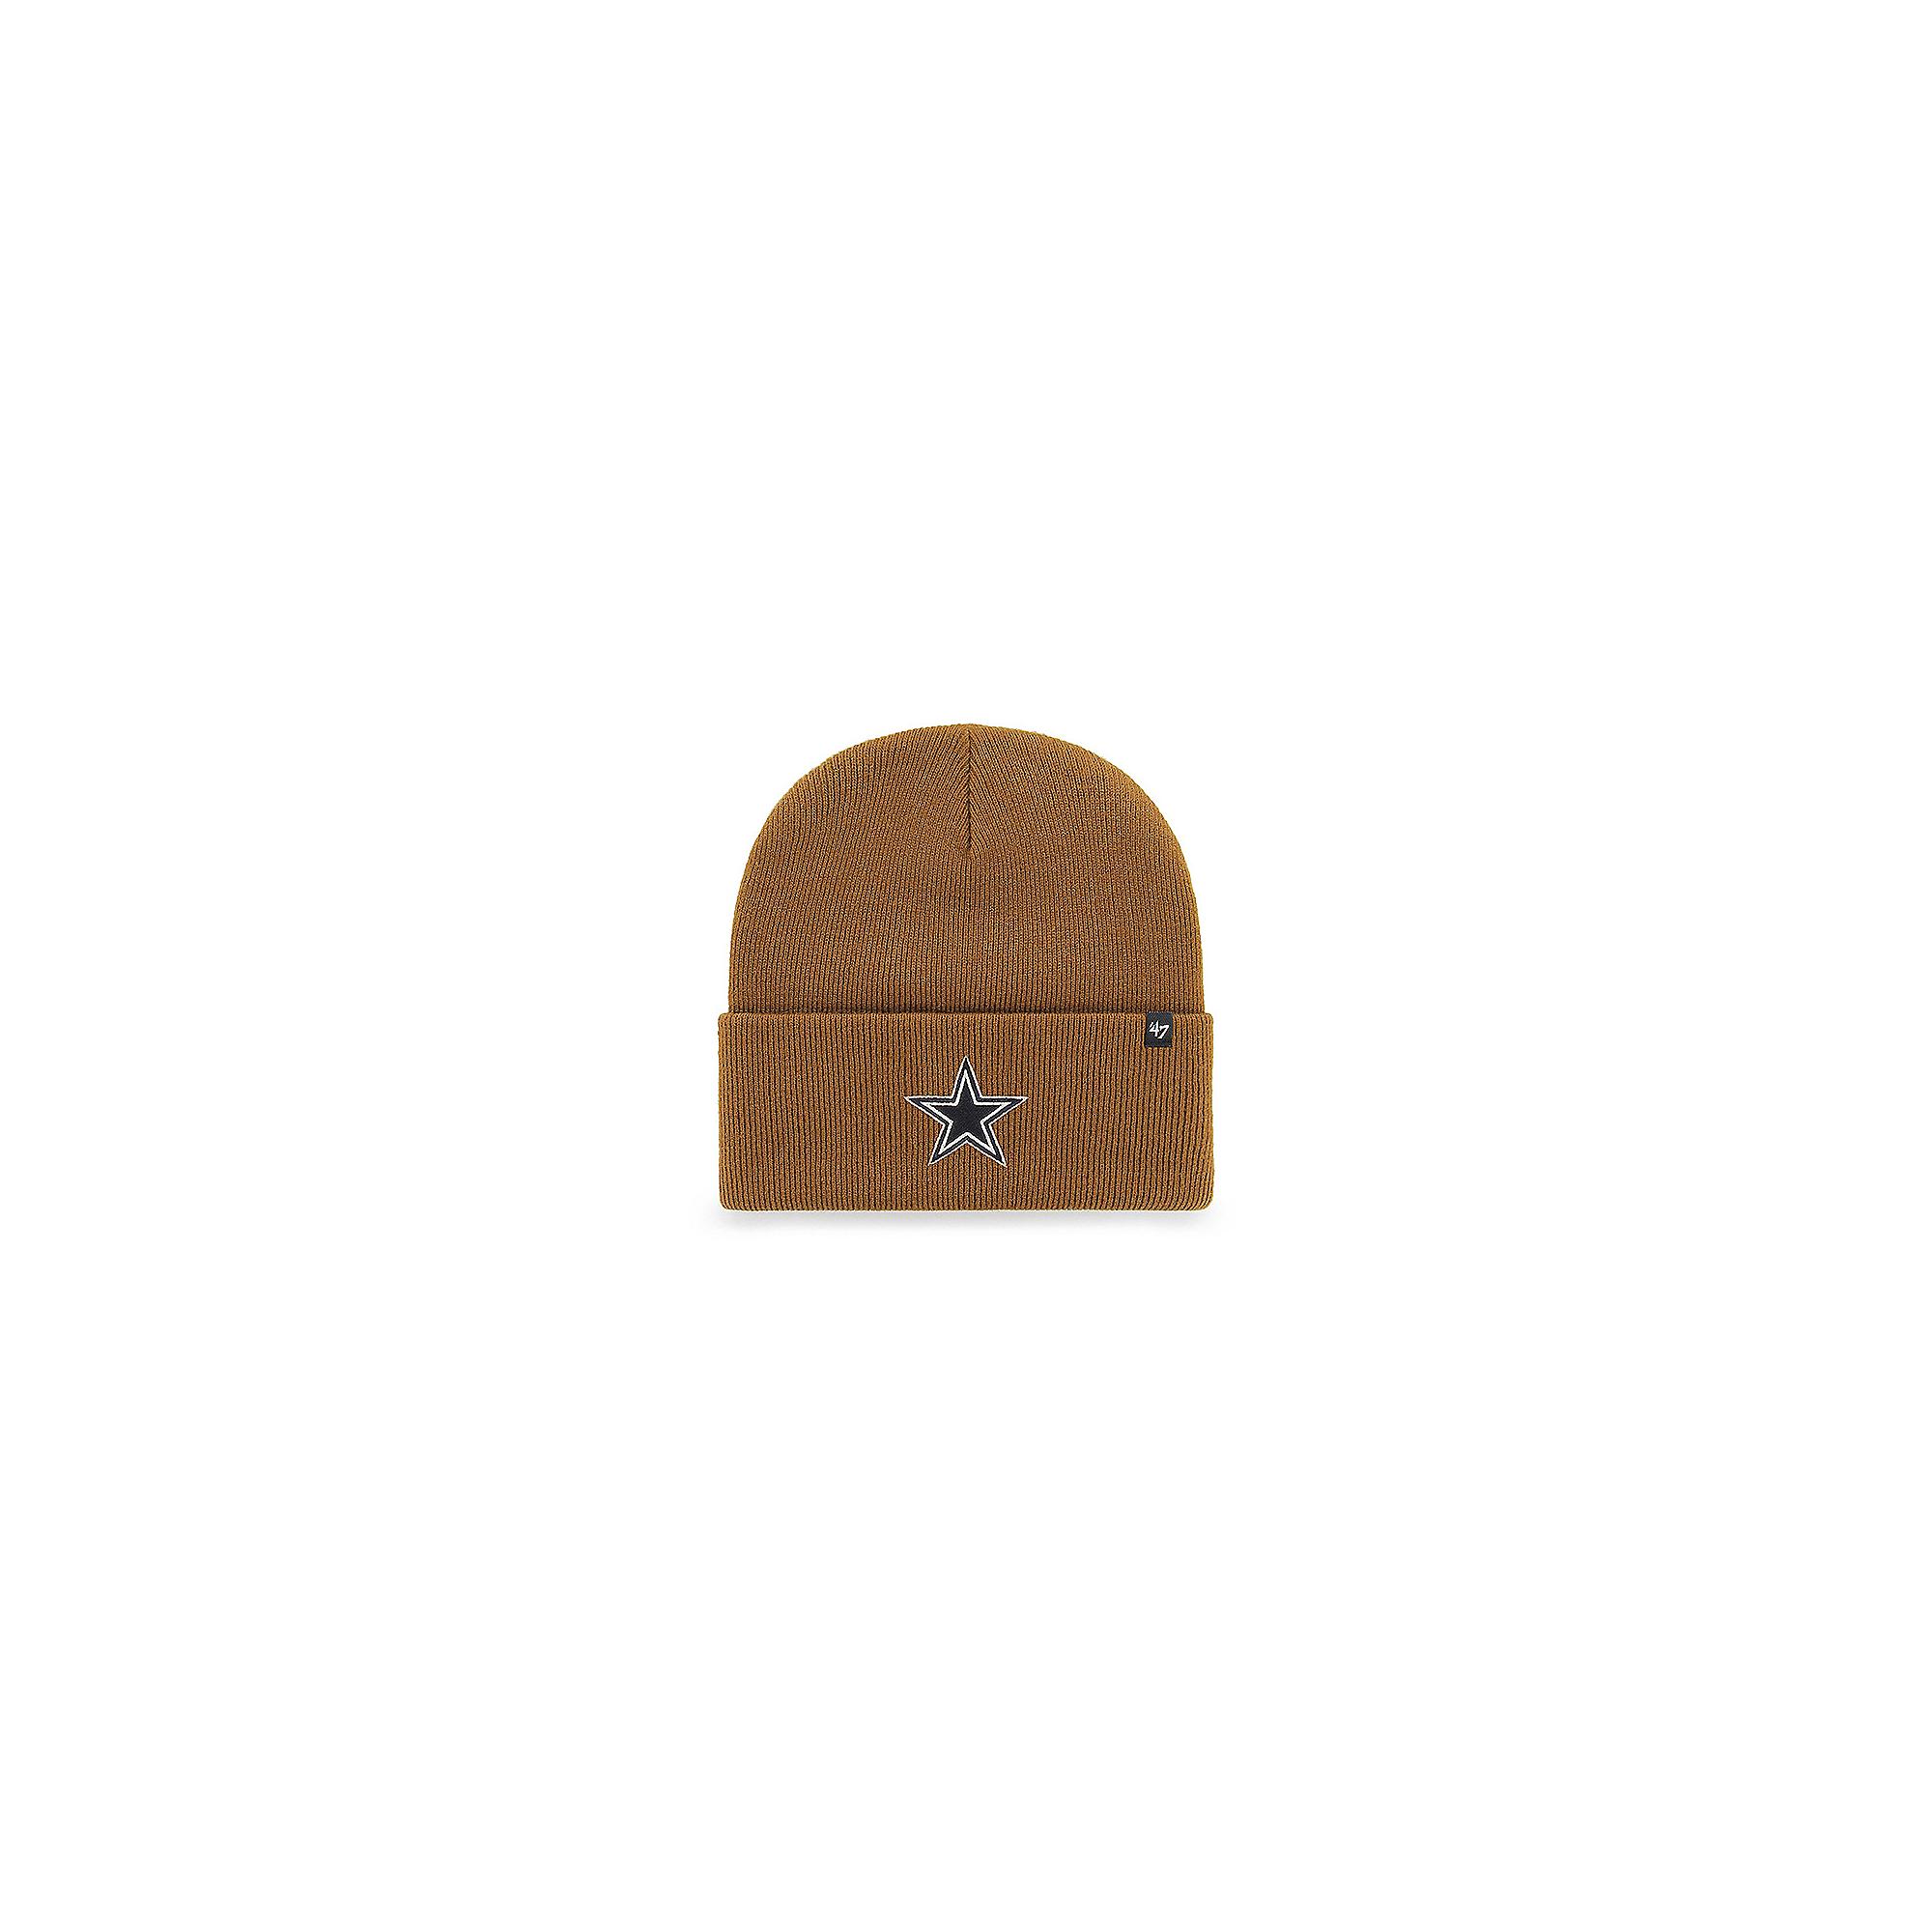 Dallas Cowboys Carhartt x '47 Brand Brown Cuff Knit Hat